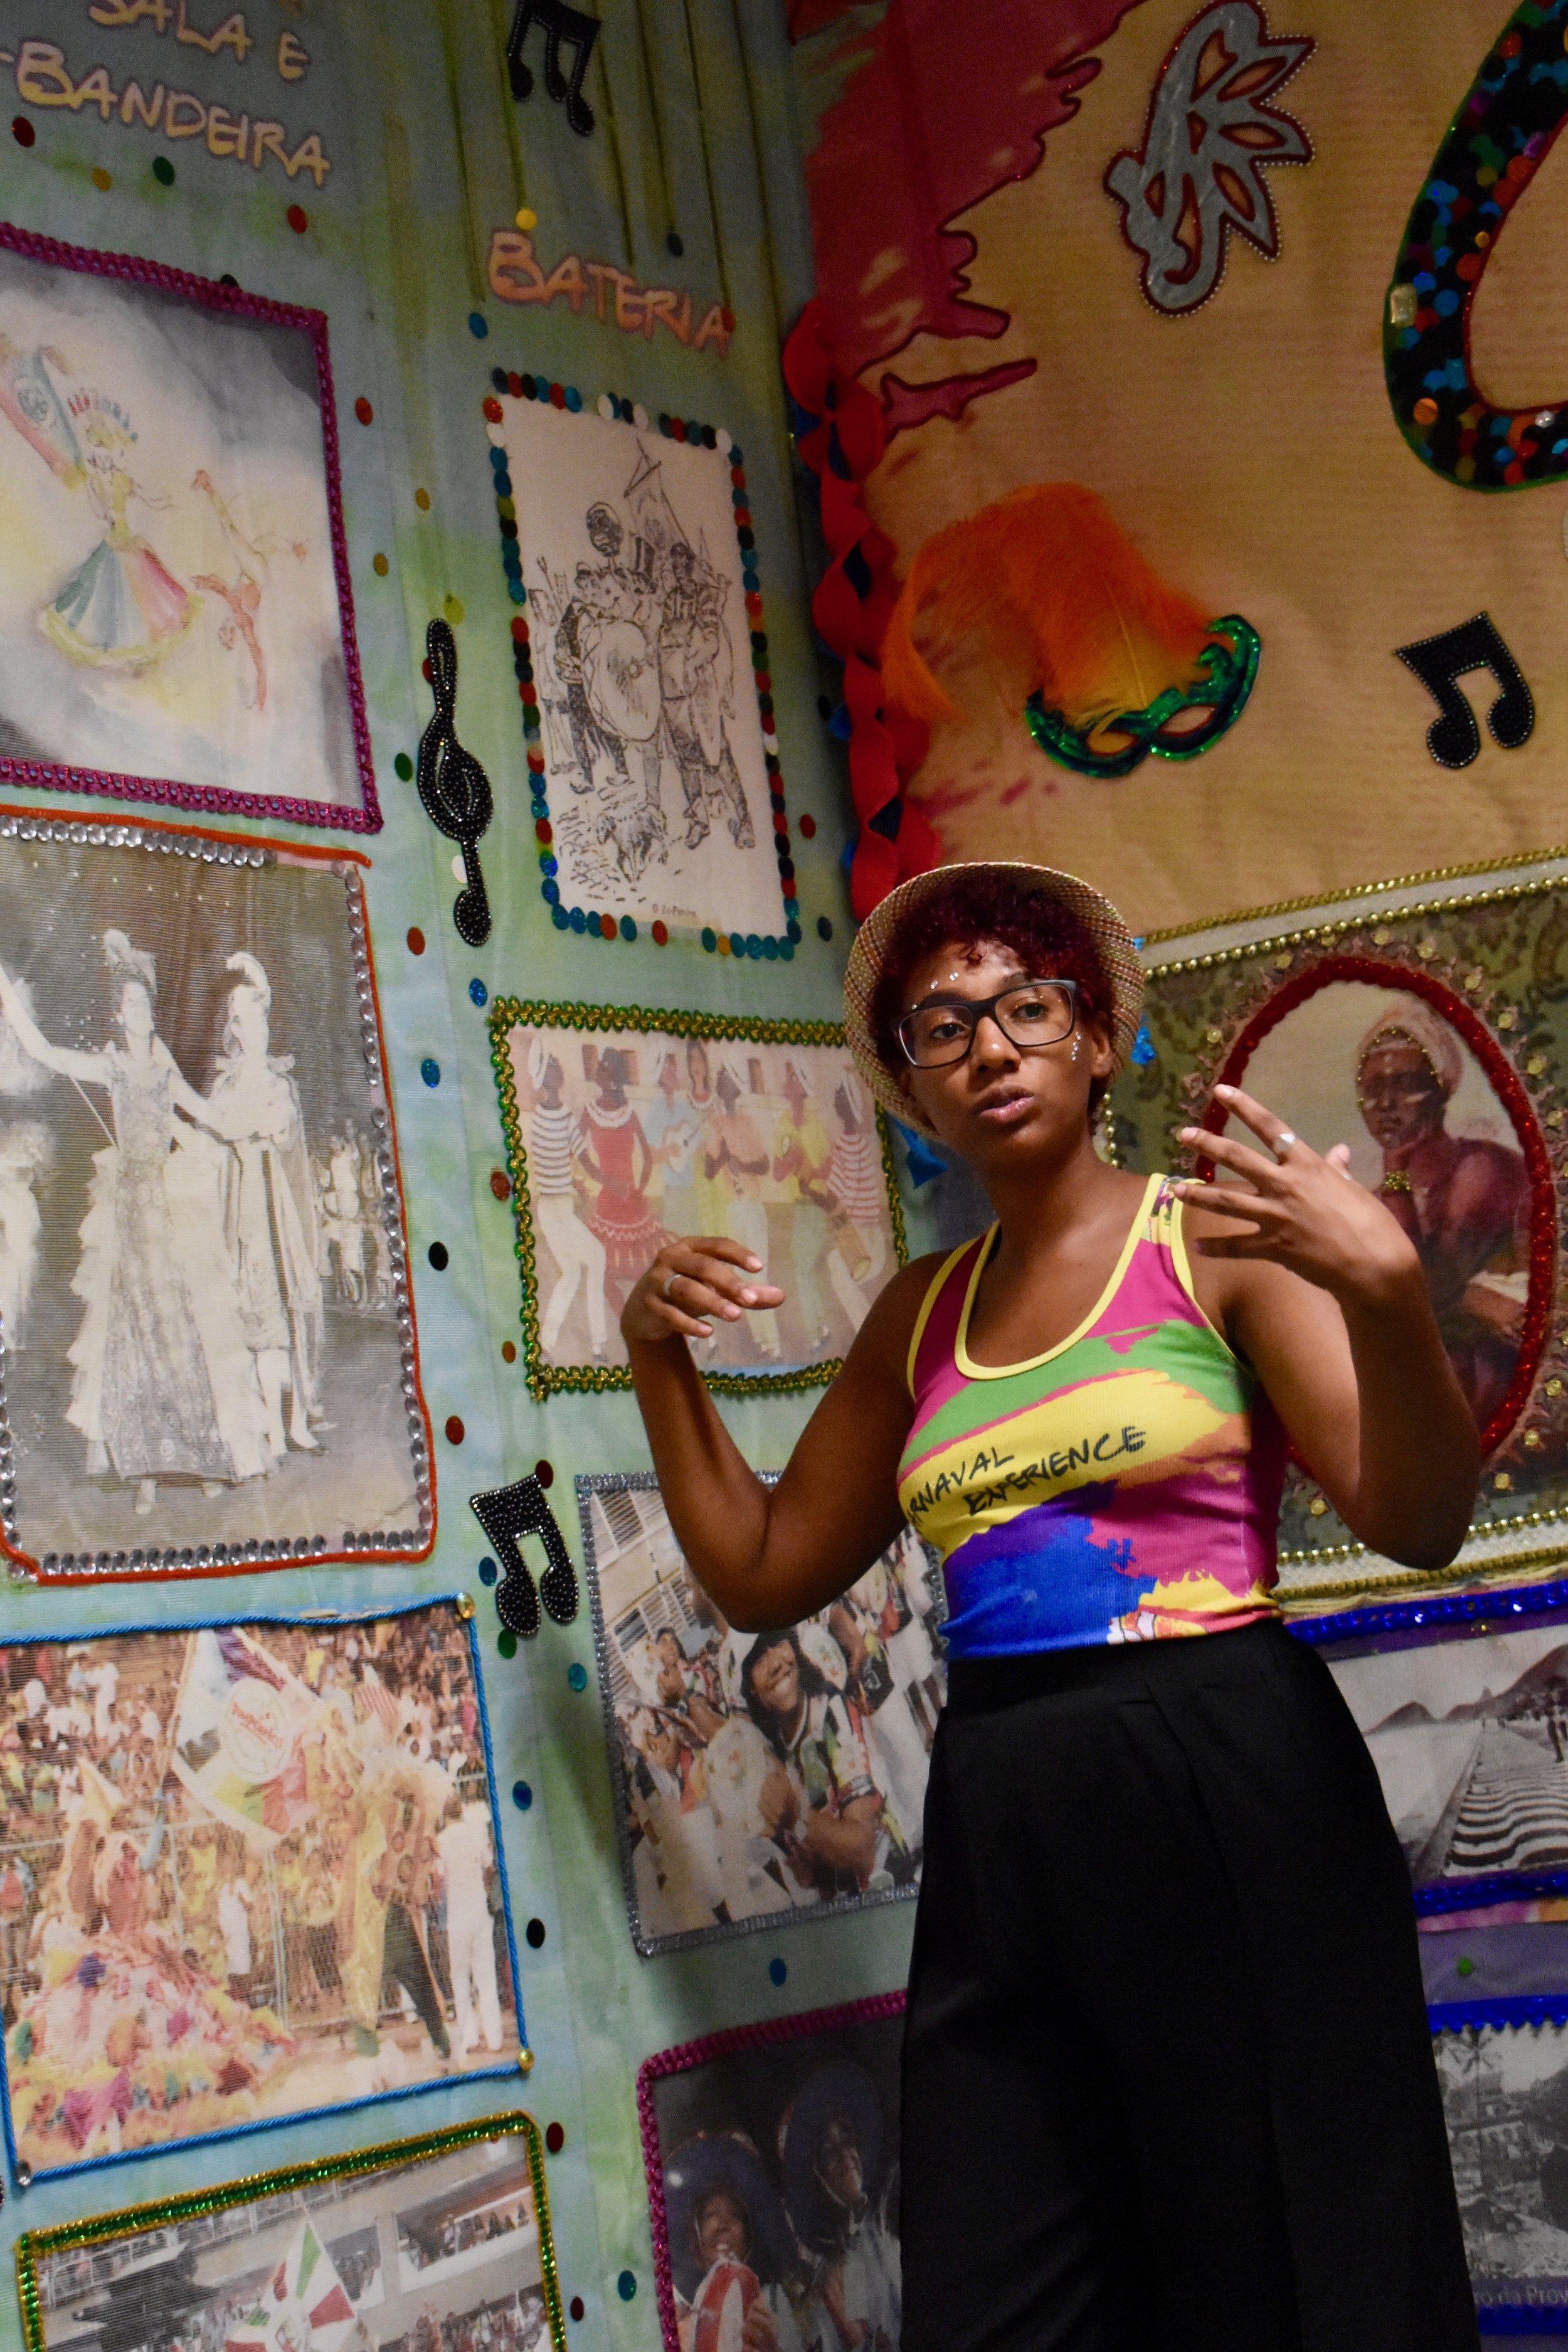 Dondara explaining the history of carnival during a tour of Grande Rio Samba School. (Courtesy of Tess Thomas / Malala Fund)